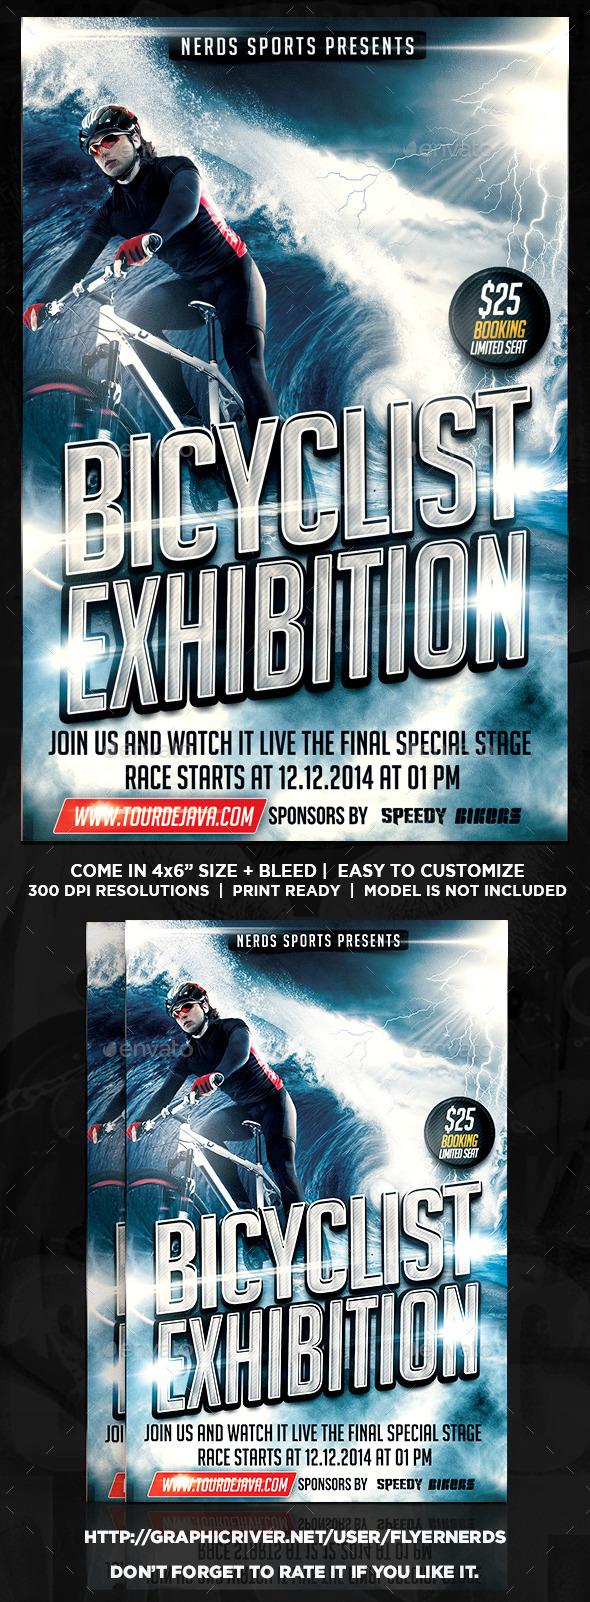 GraphicRiver Bicyclist Exhibition Sports Flyer 11307660